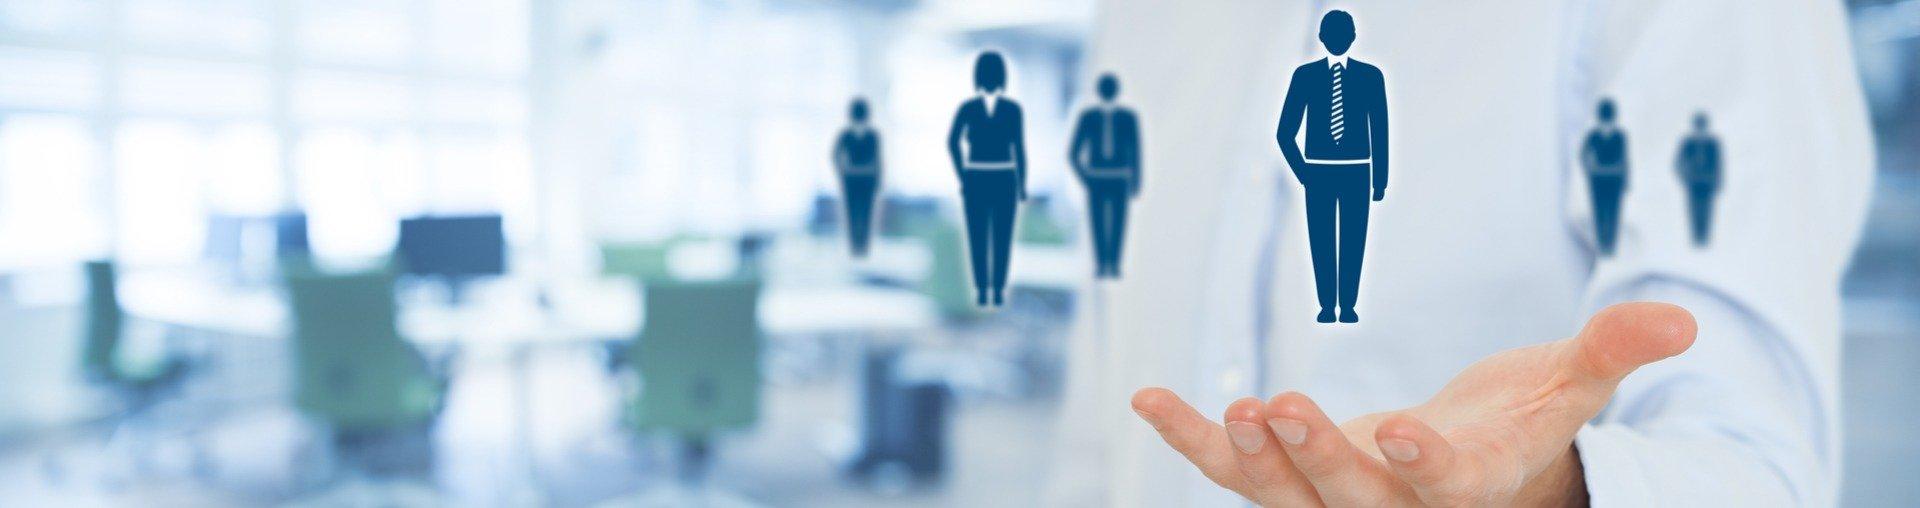 Ce își doresc candidații din piața muncii